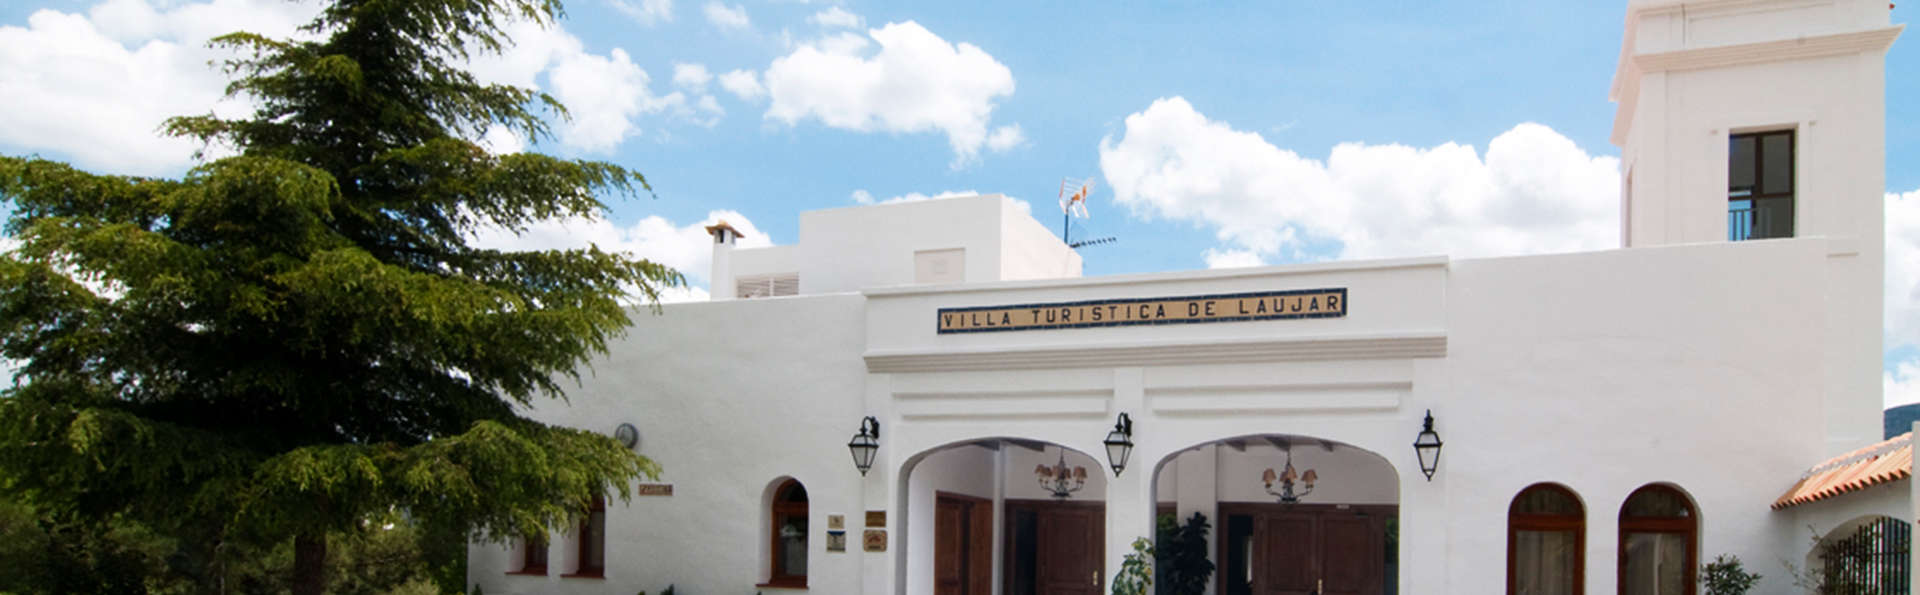 Villa Turística de Laujar de Andarax - EDIT_front1.jpg